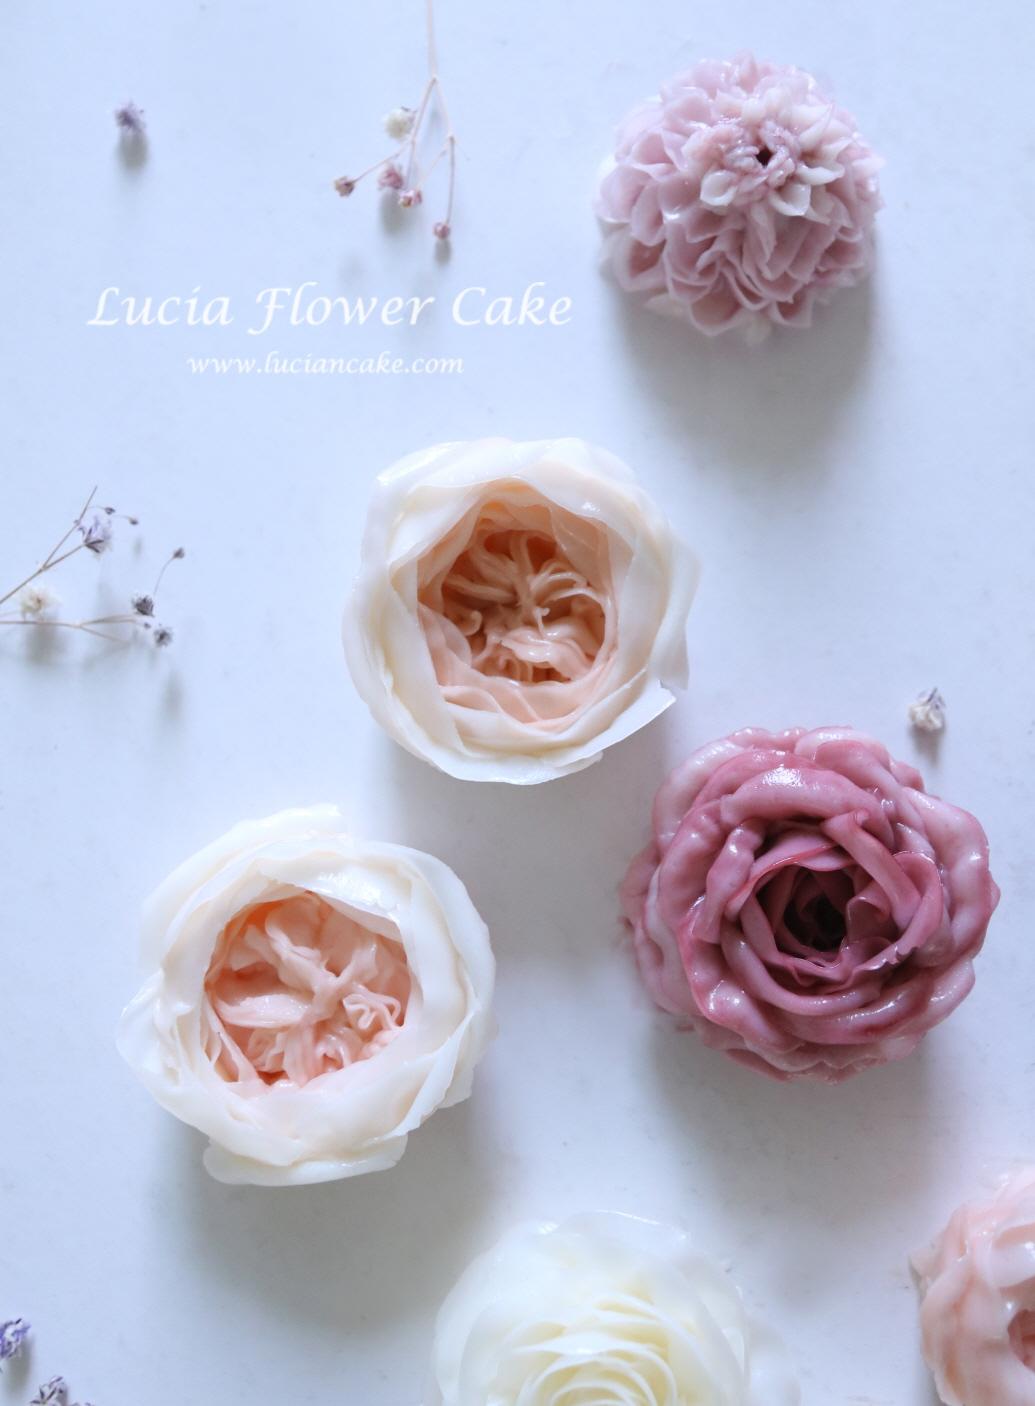 lucia's work